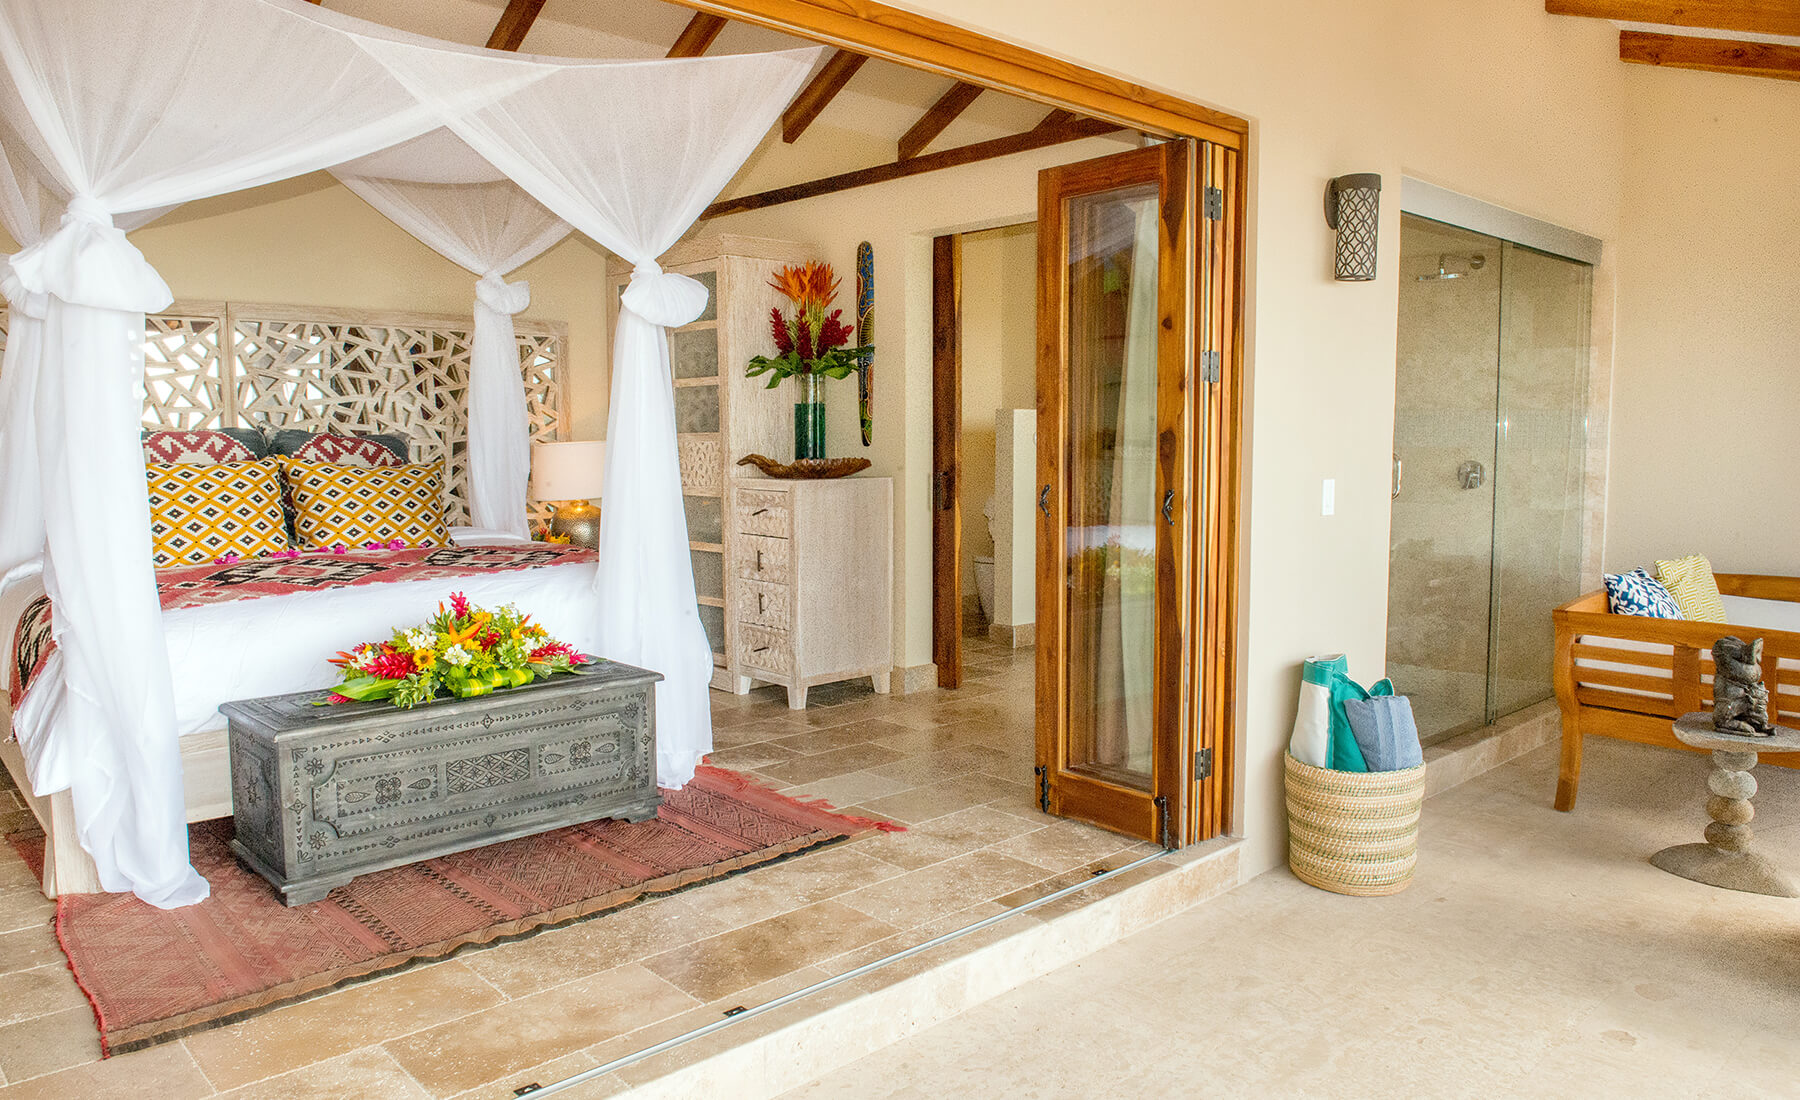 Costa-Rica-Villa-terrace-view-on-bedroom